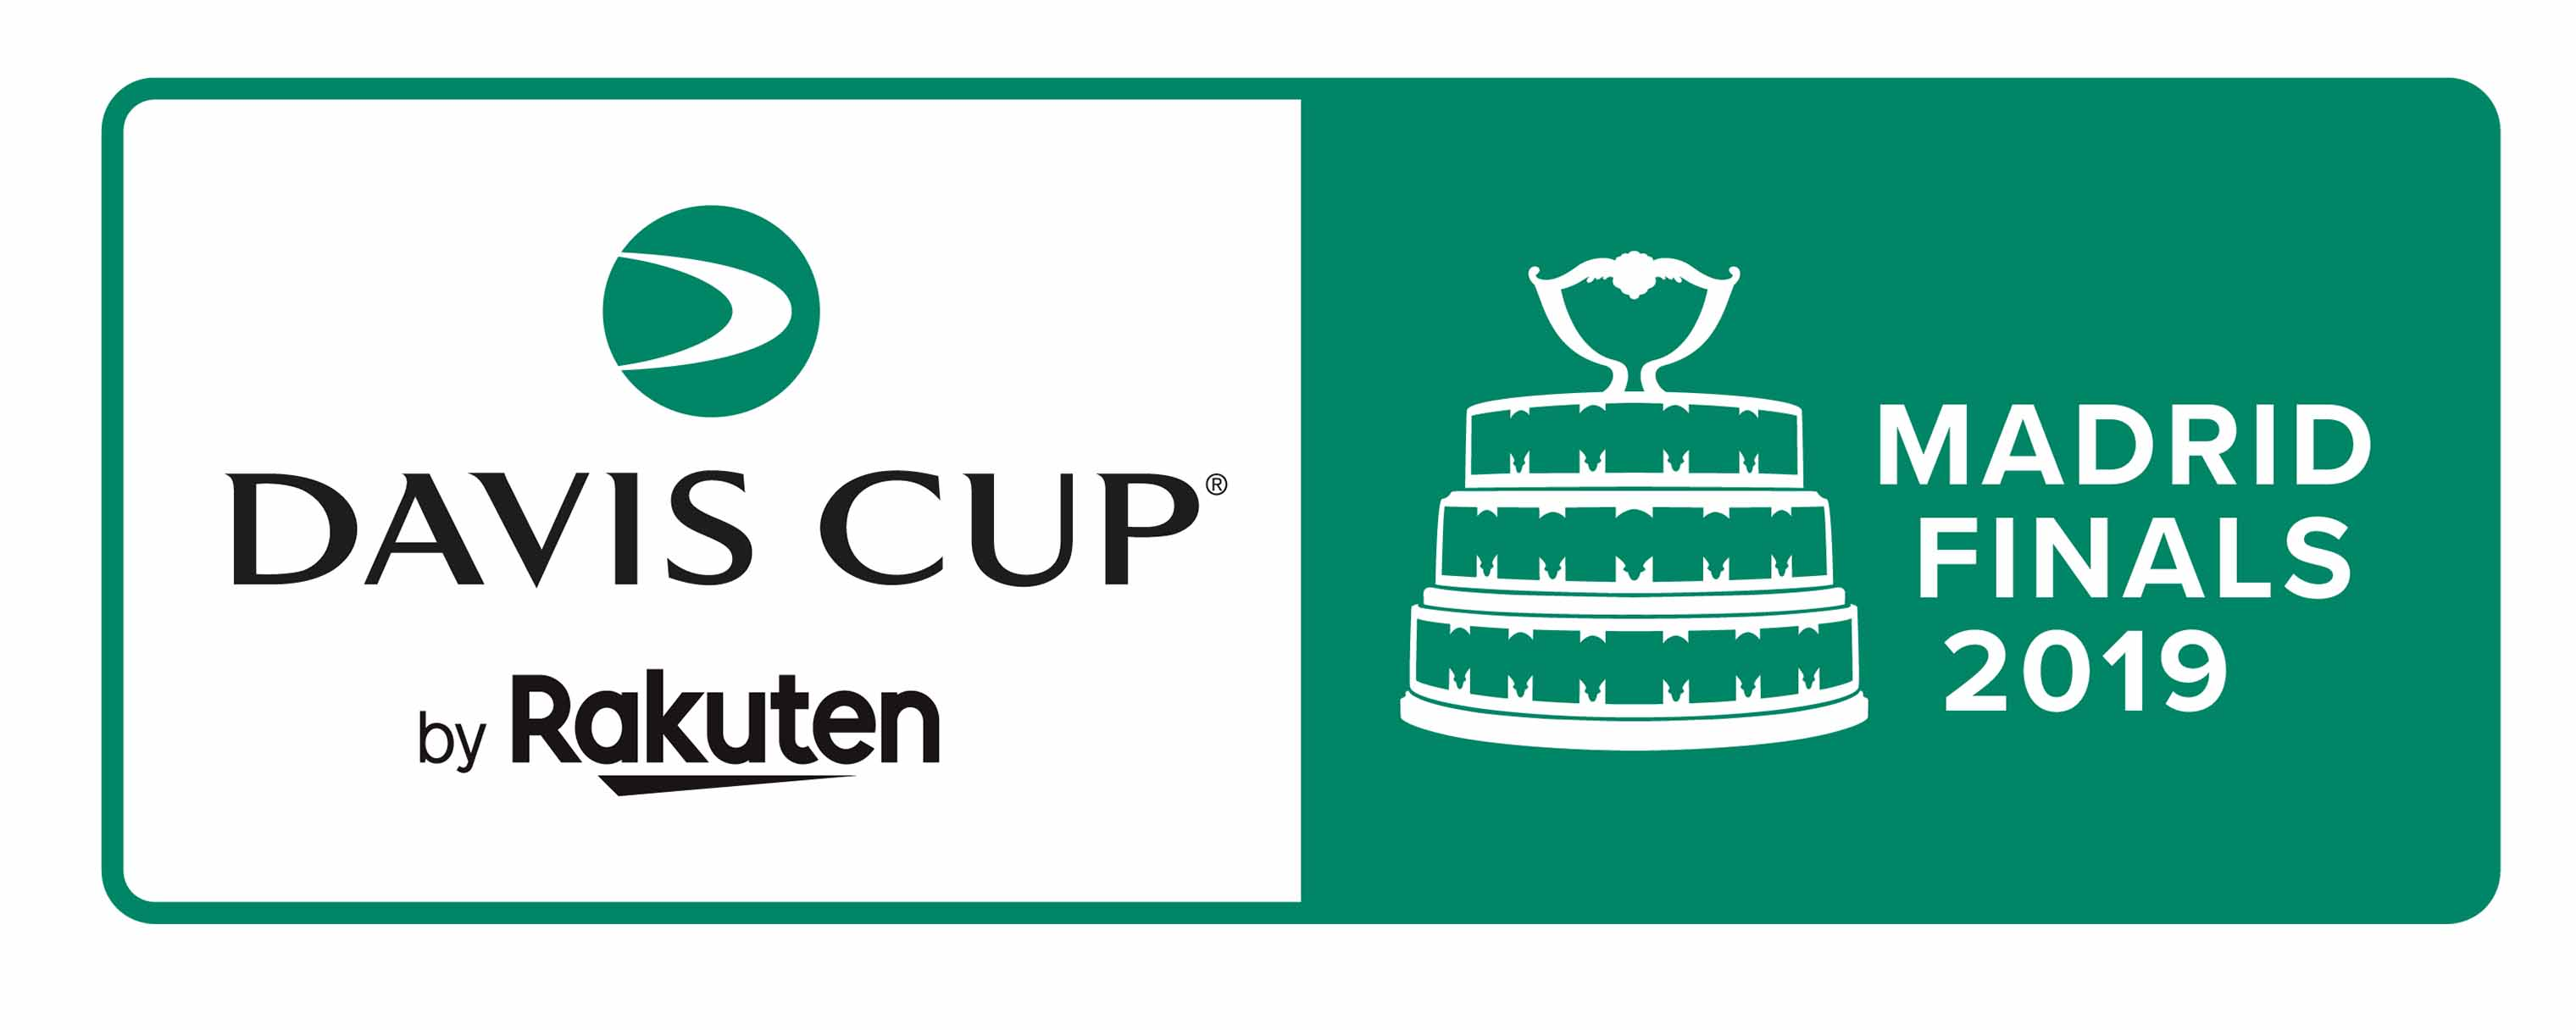 Davis Cup Madrid Finals logo